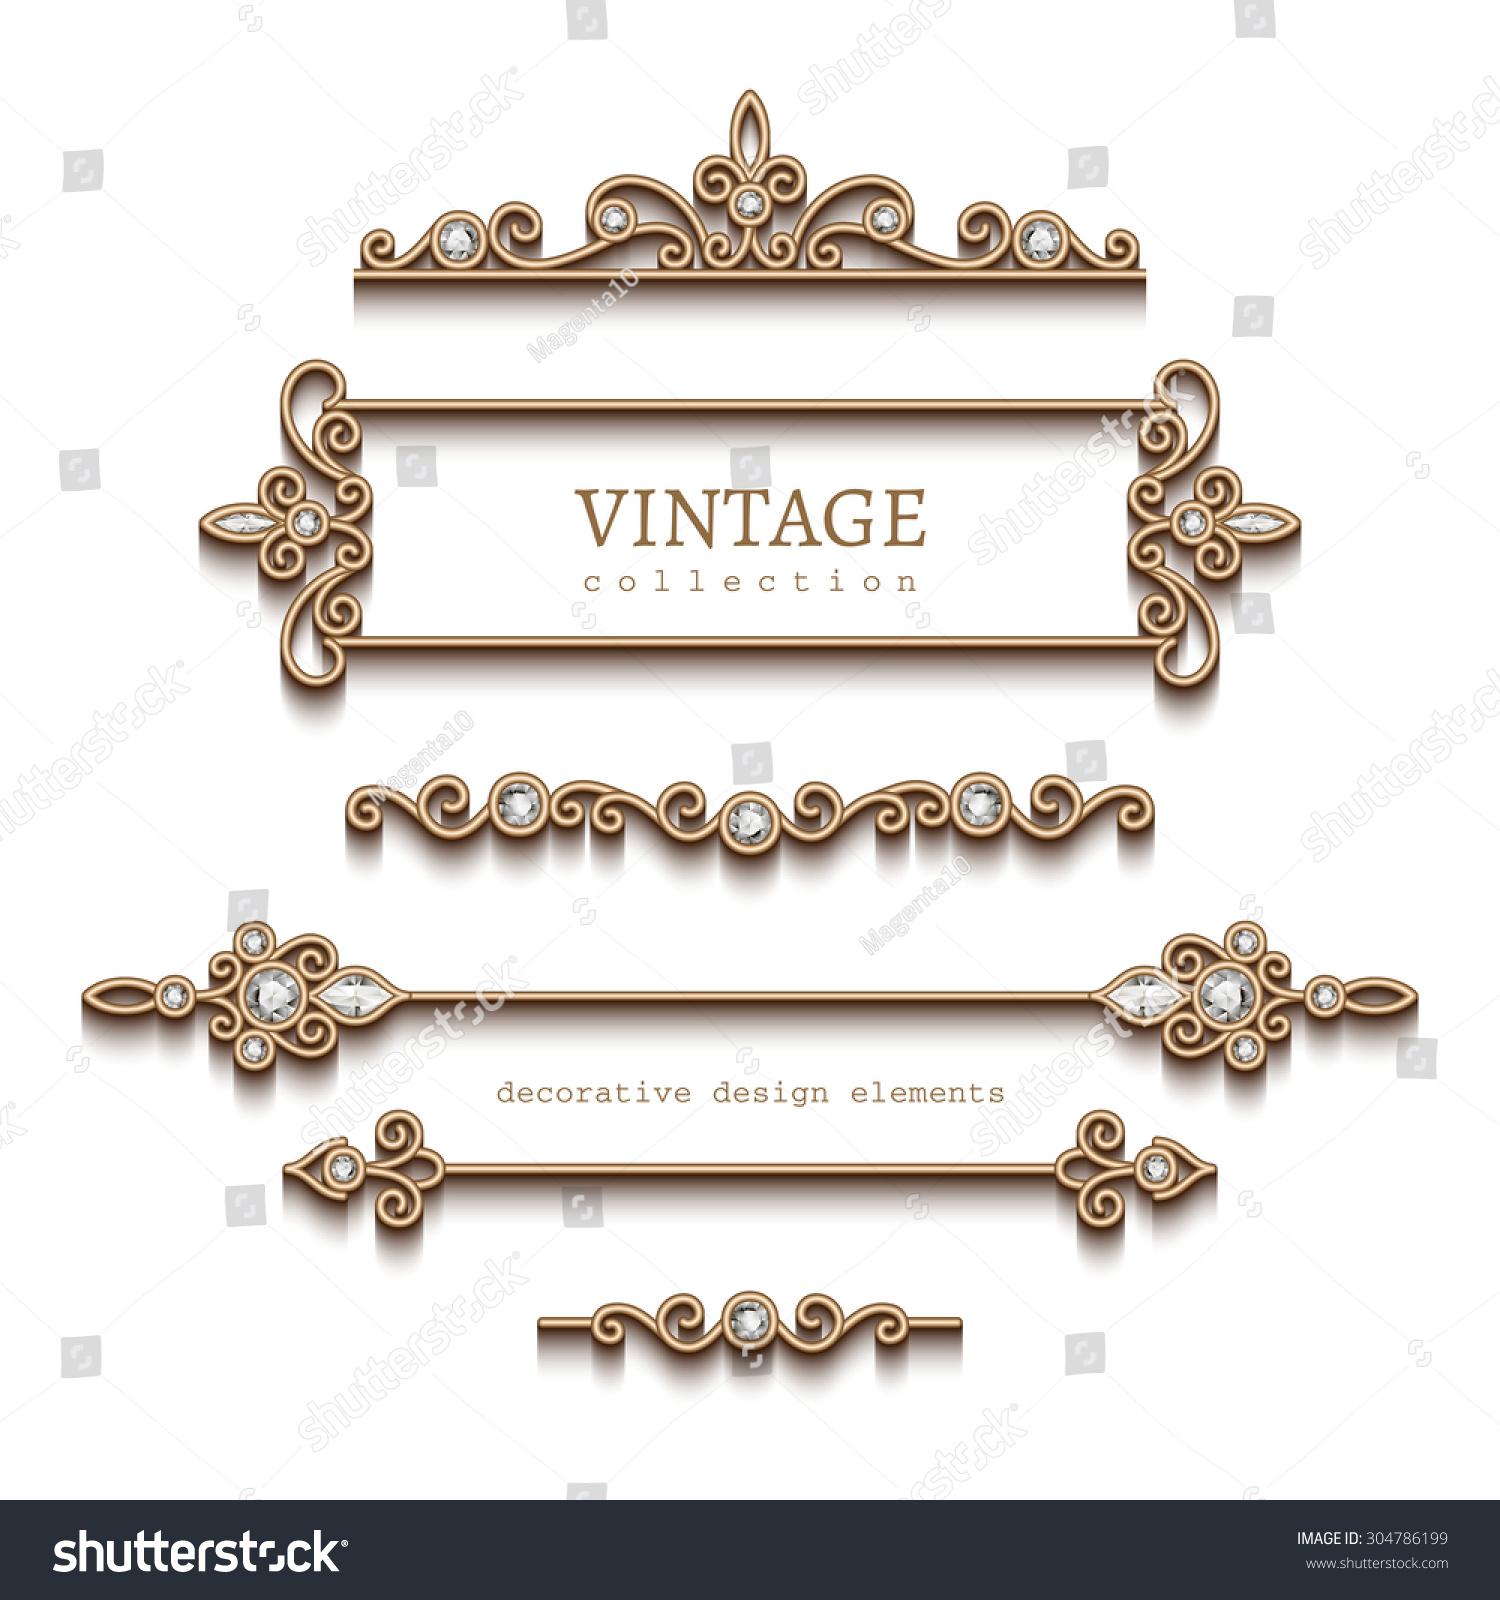 Gold Jewelry Vector Art & Graphics